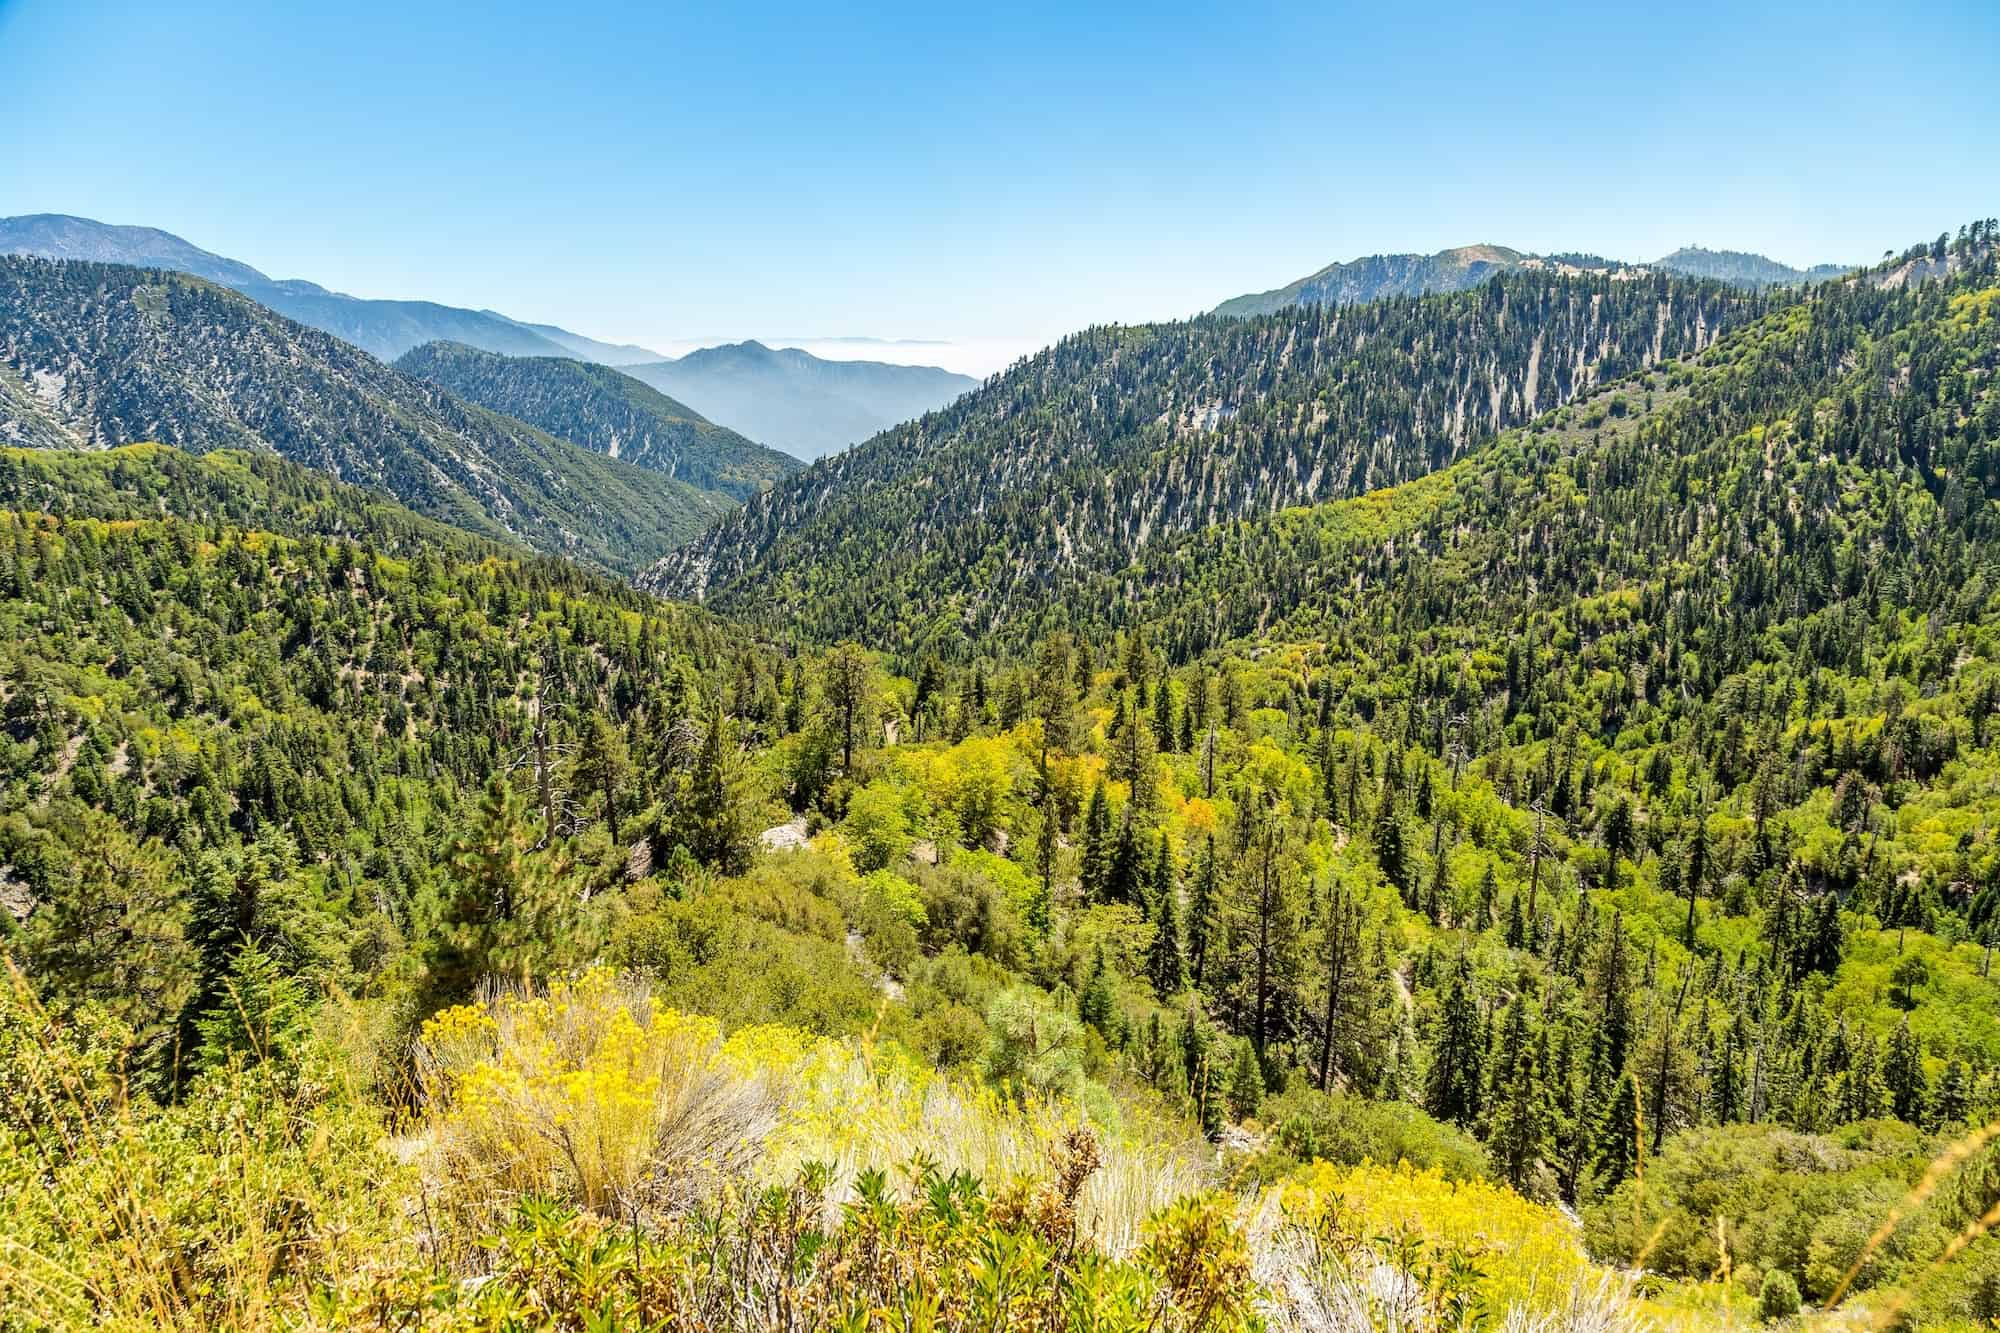 Beat the Heat in the San Bernardino National Forest